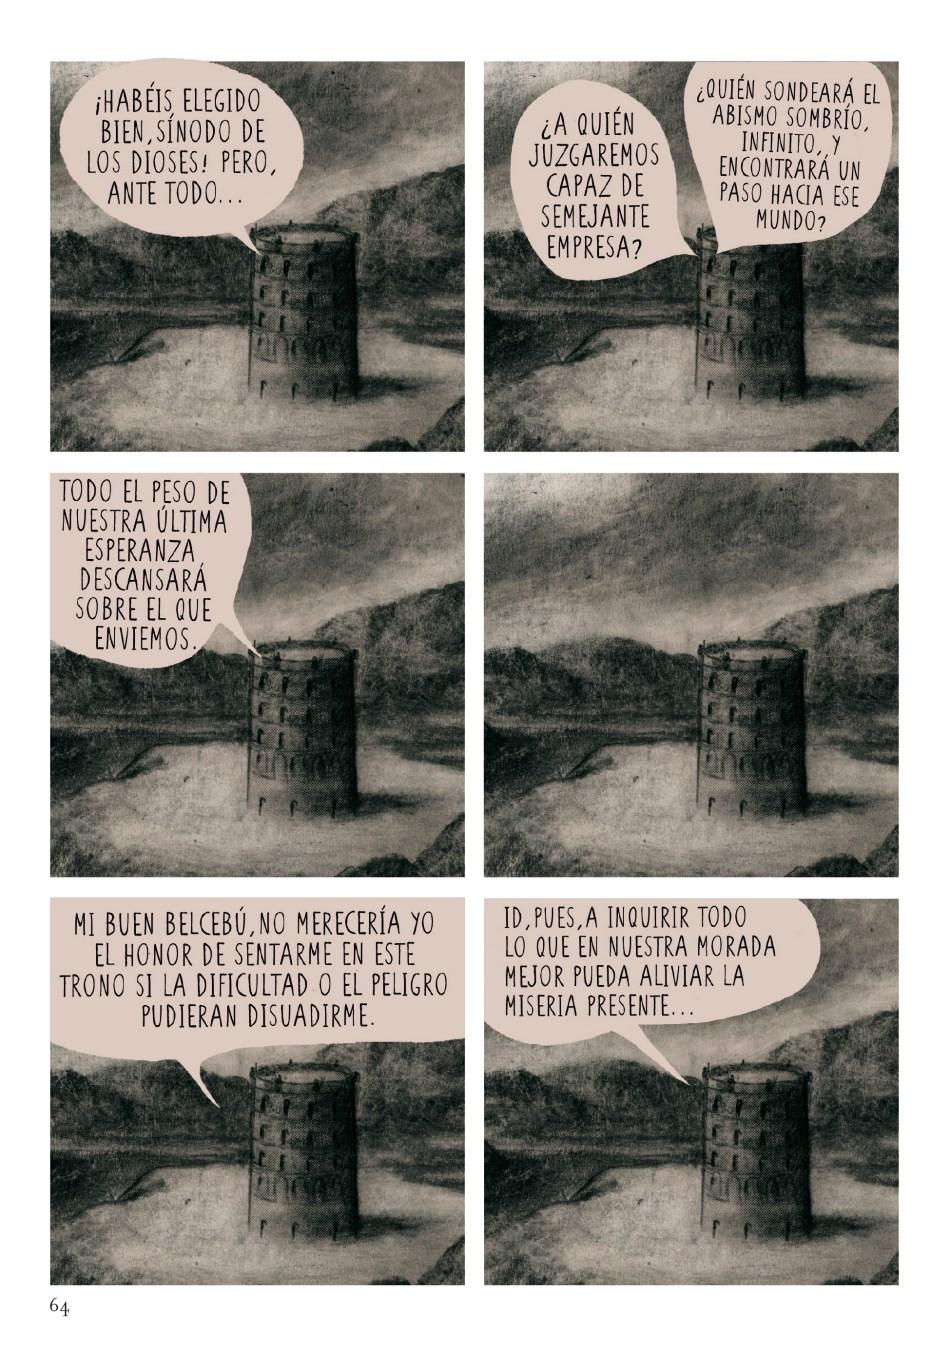 Pages from ParaisoPerdidoALTA-5